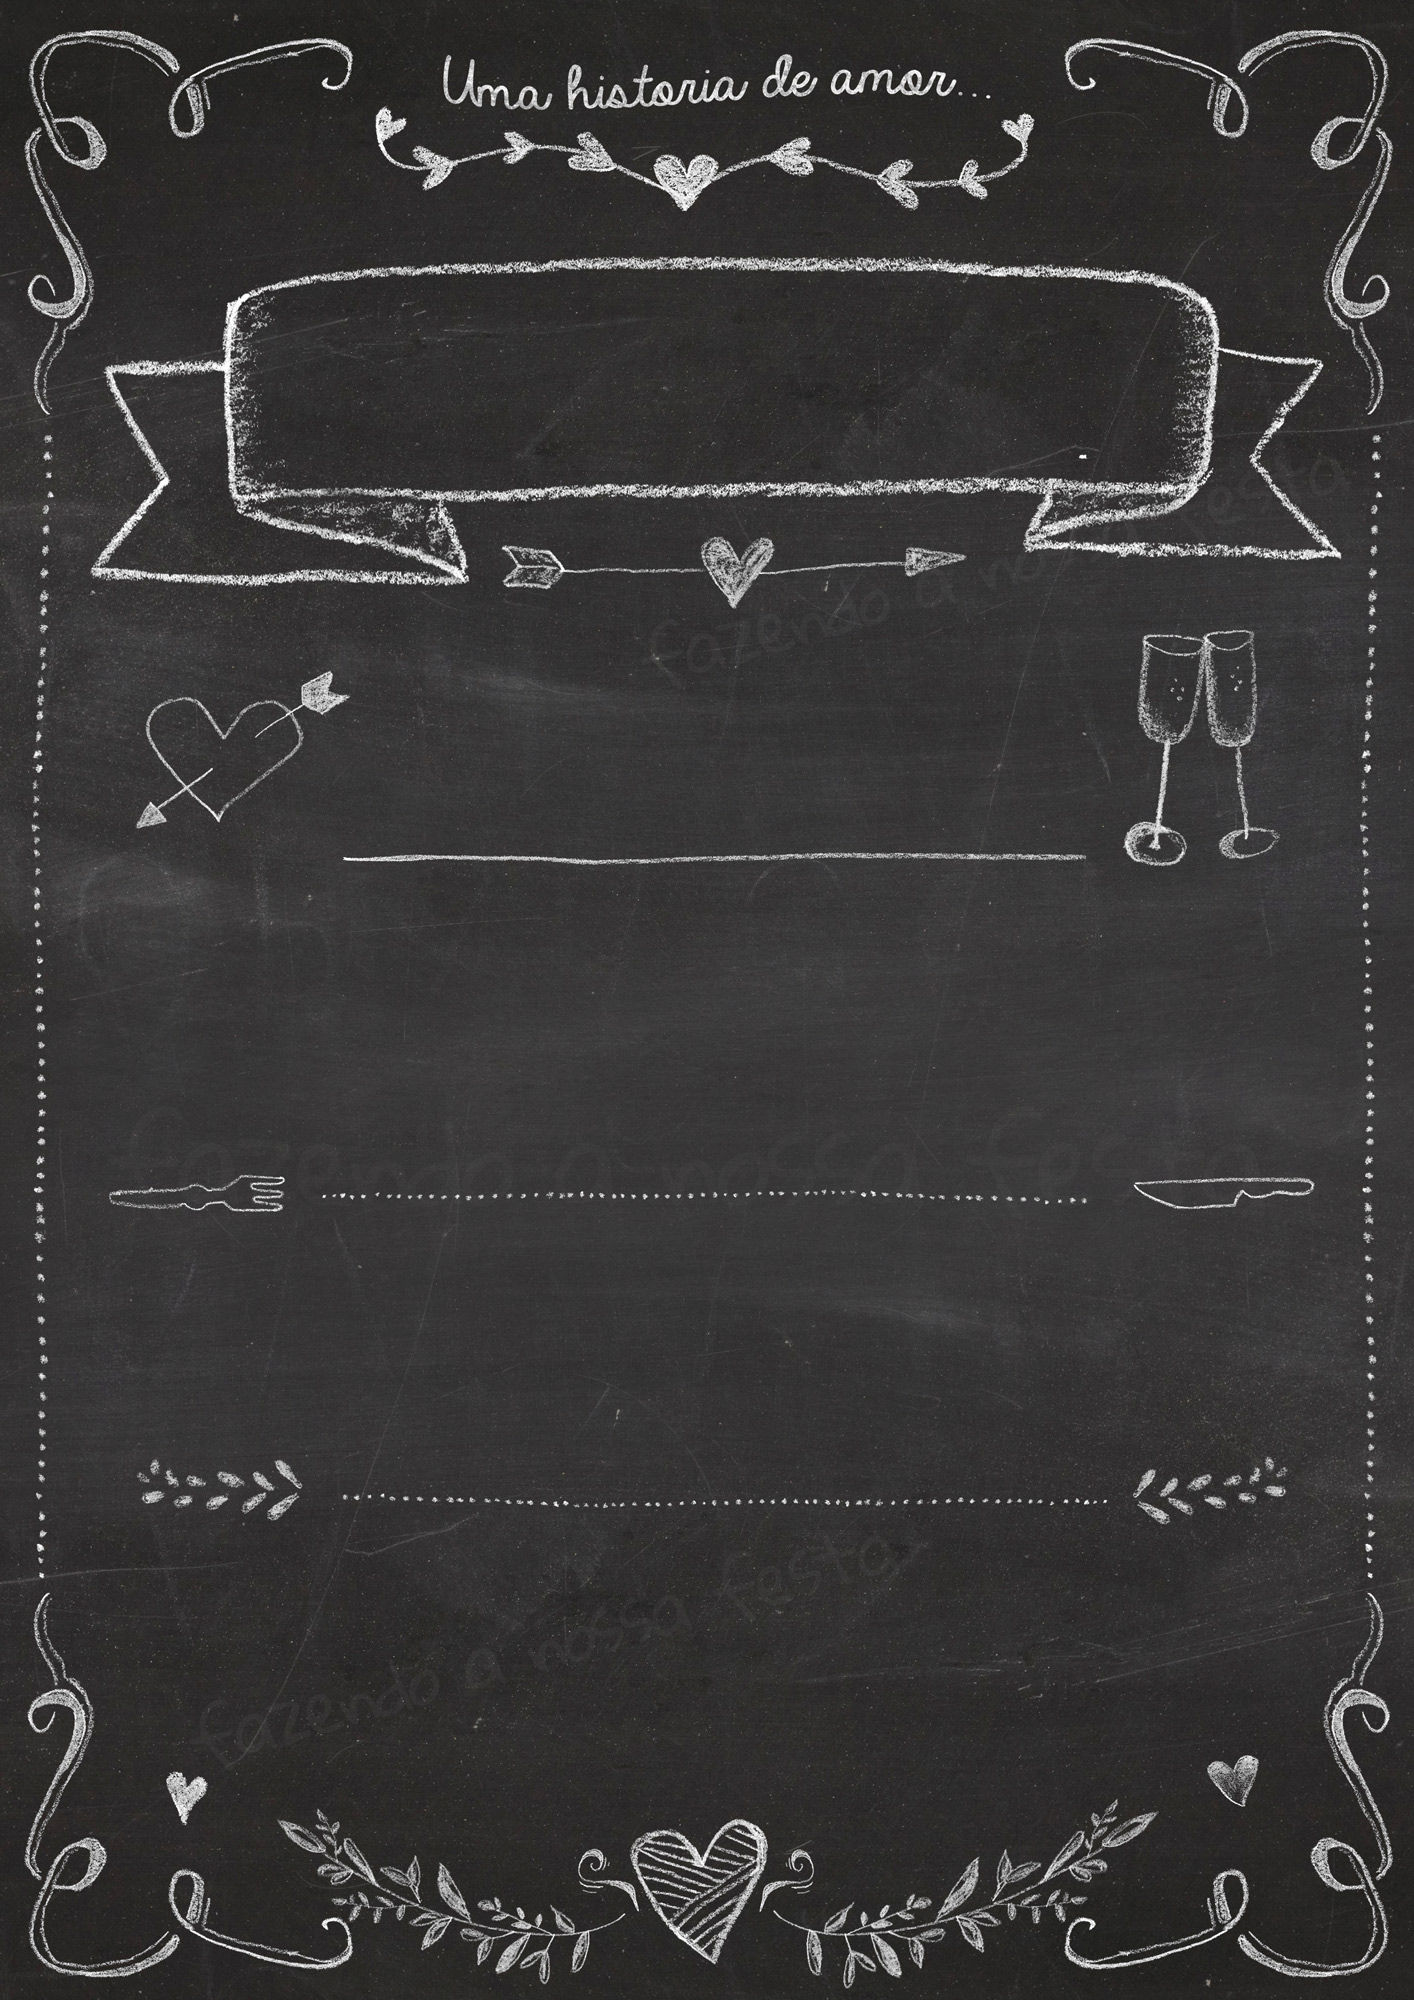 Chalkboard Chalkboard Dia Dos Namorados Gratis